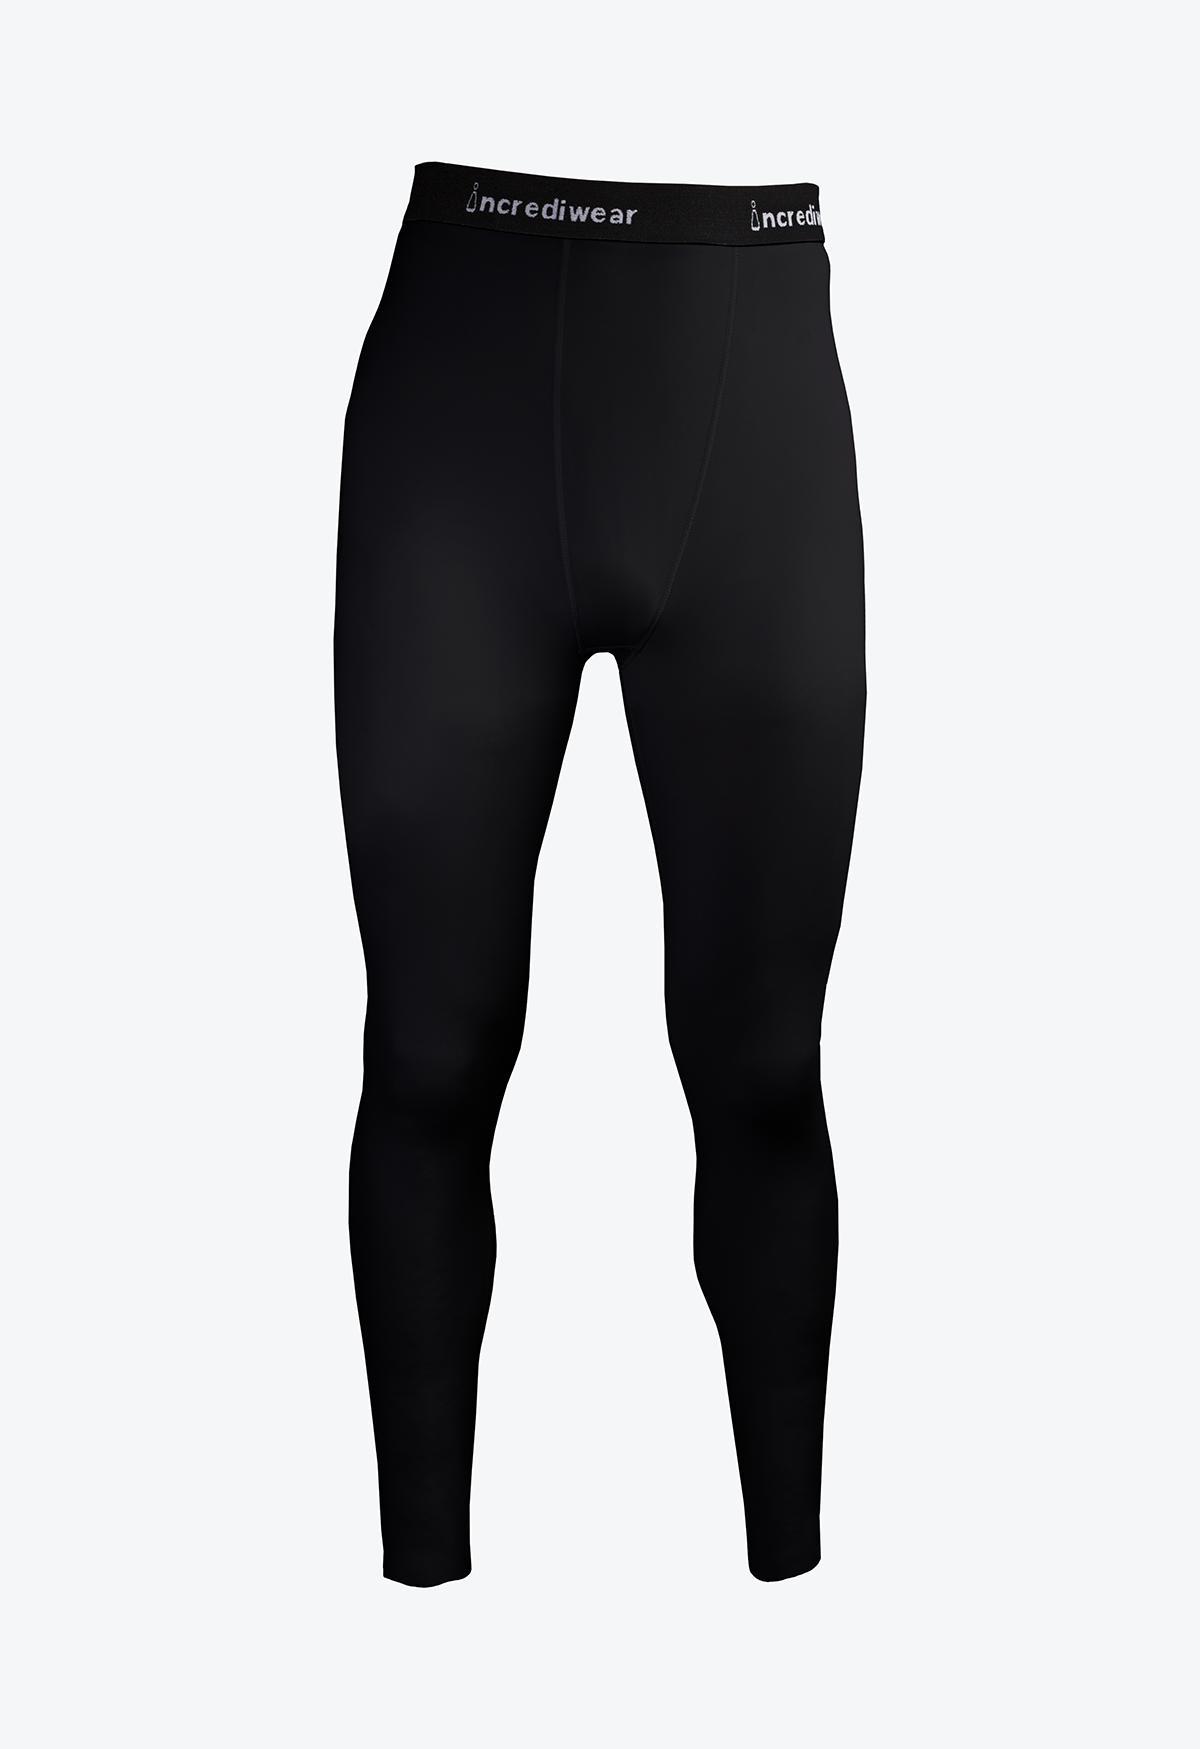 Mens Performance Pants - Black - Front